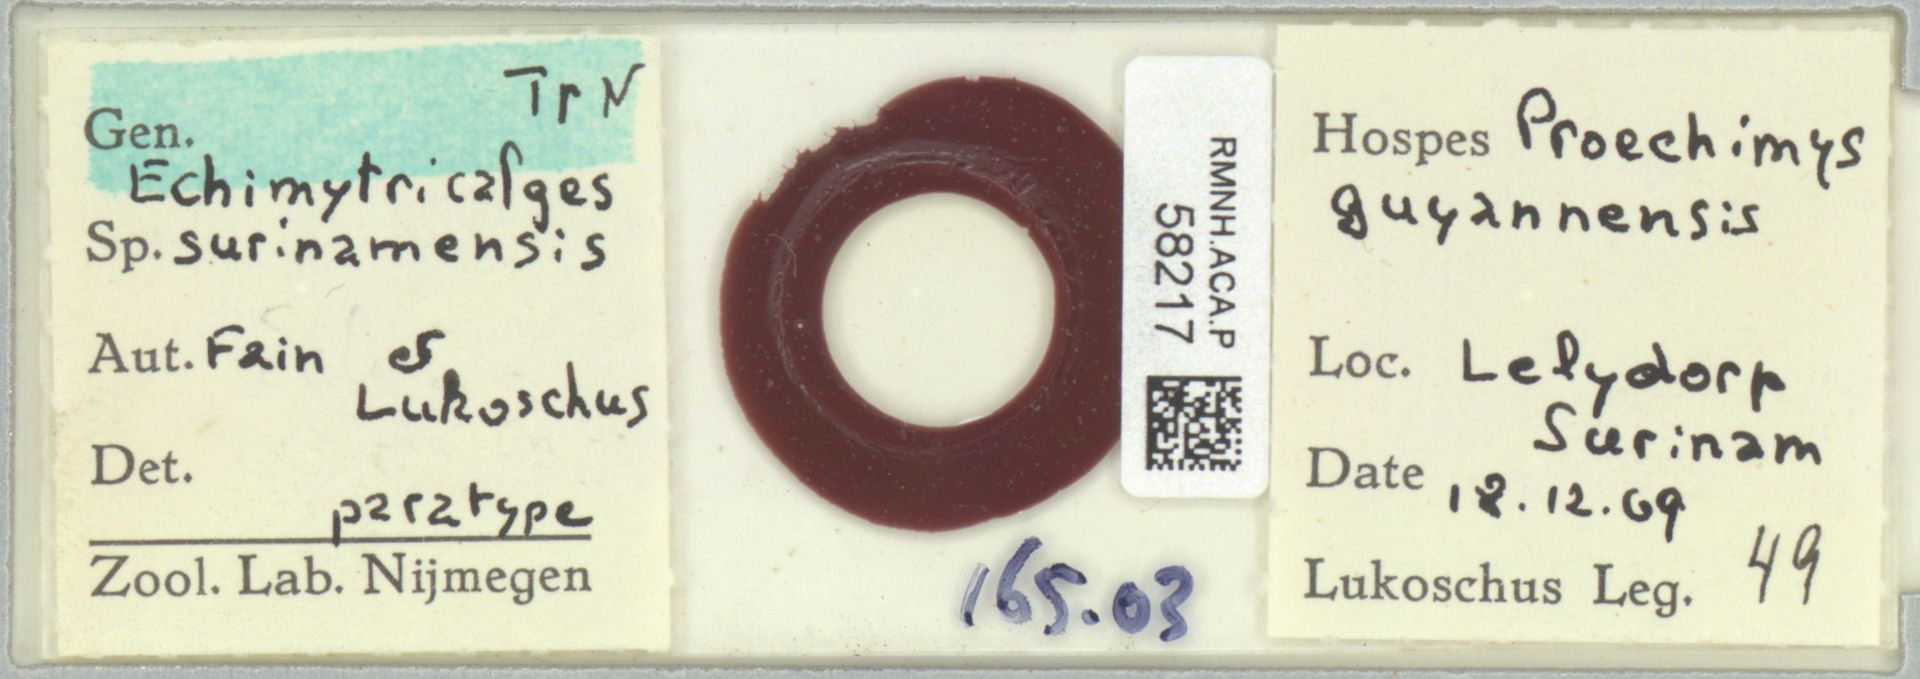 RMNH.ACA.P.58217   Echimytricalges surinamensis Fain & Lukoschus